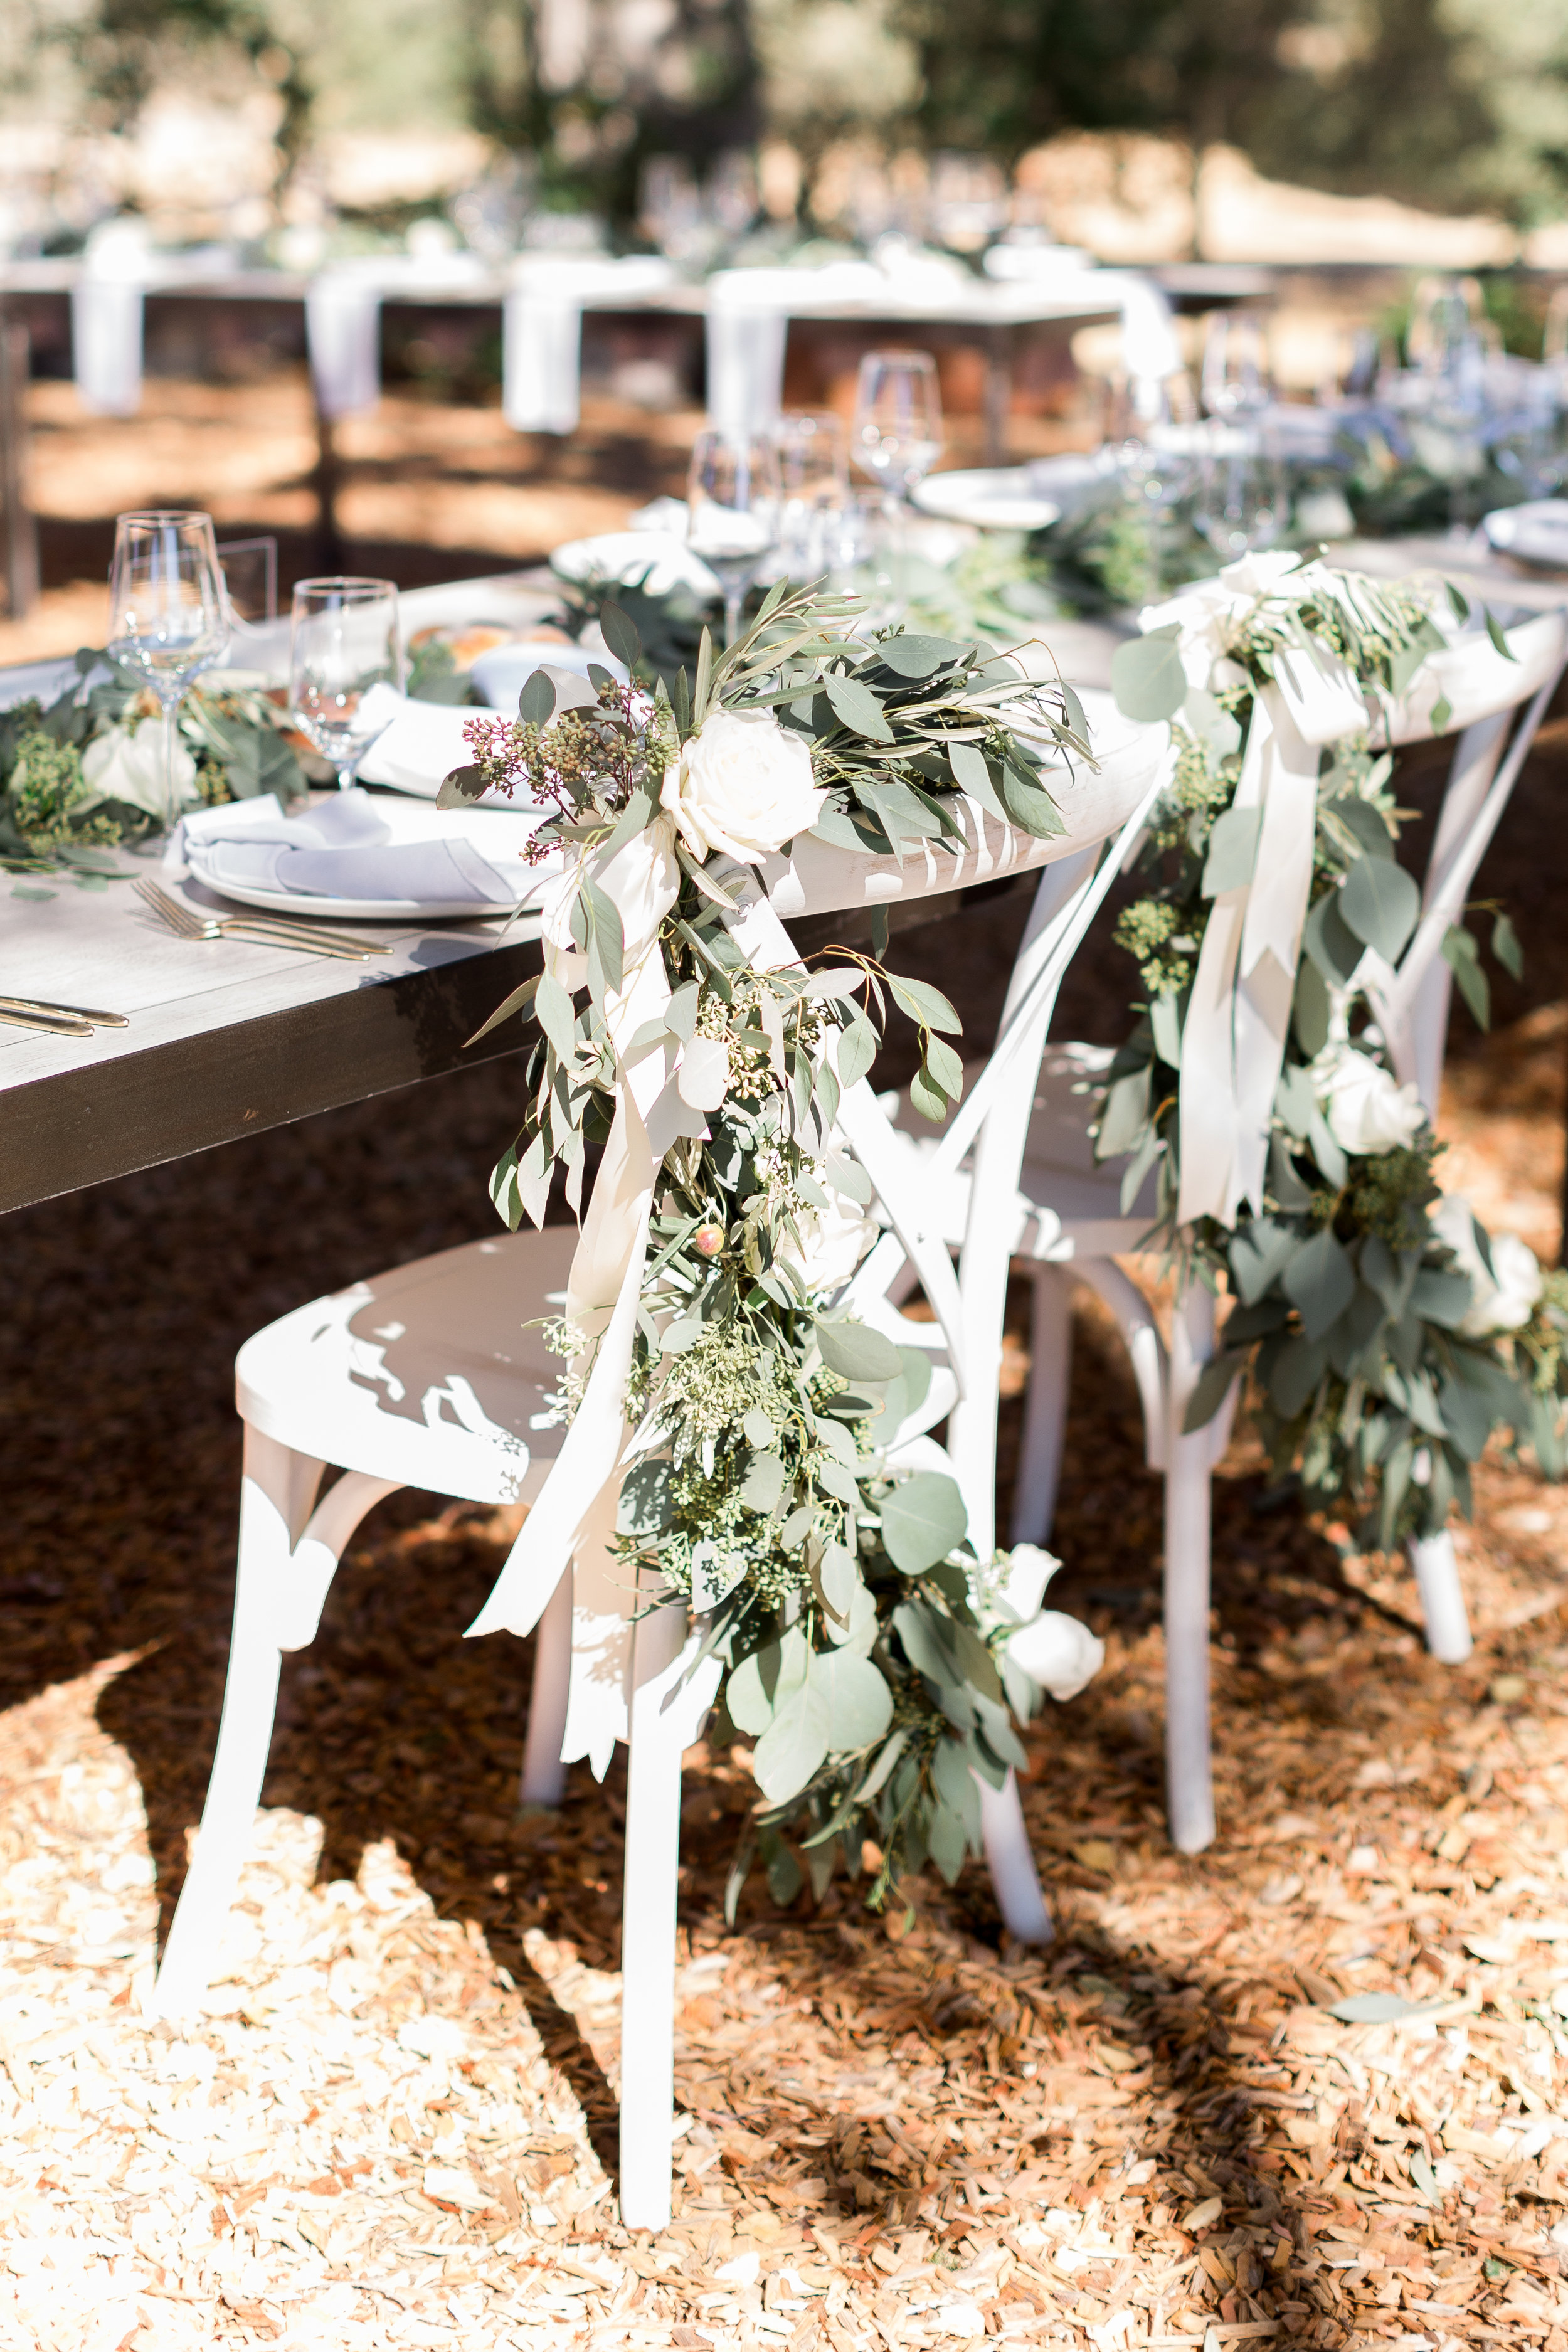 Calegari-Vineyards-Healdsburg-Wedding-Photographer (4 of 4).jpg